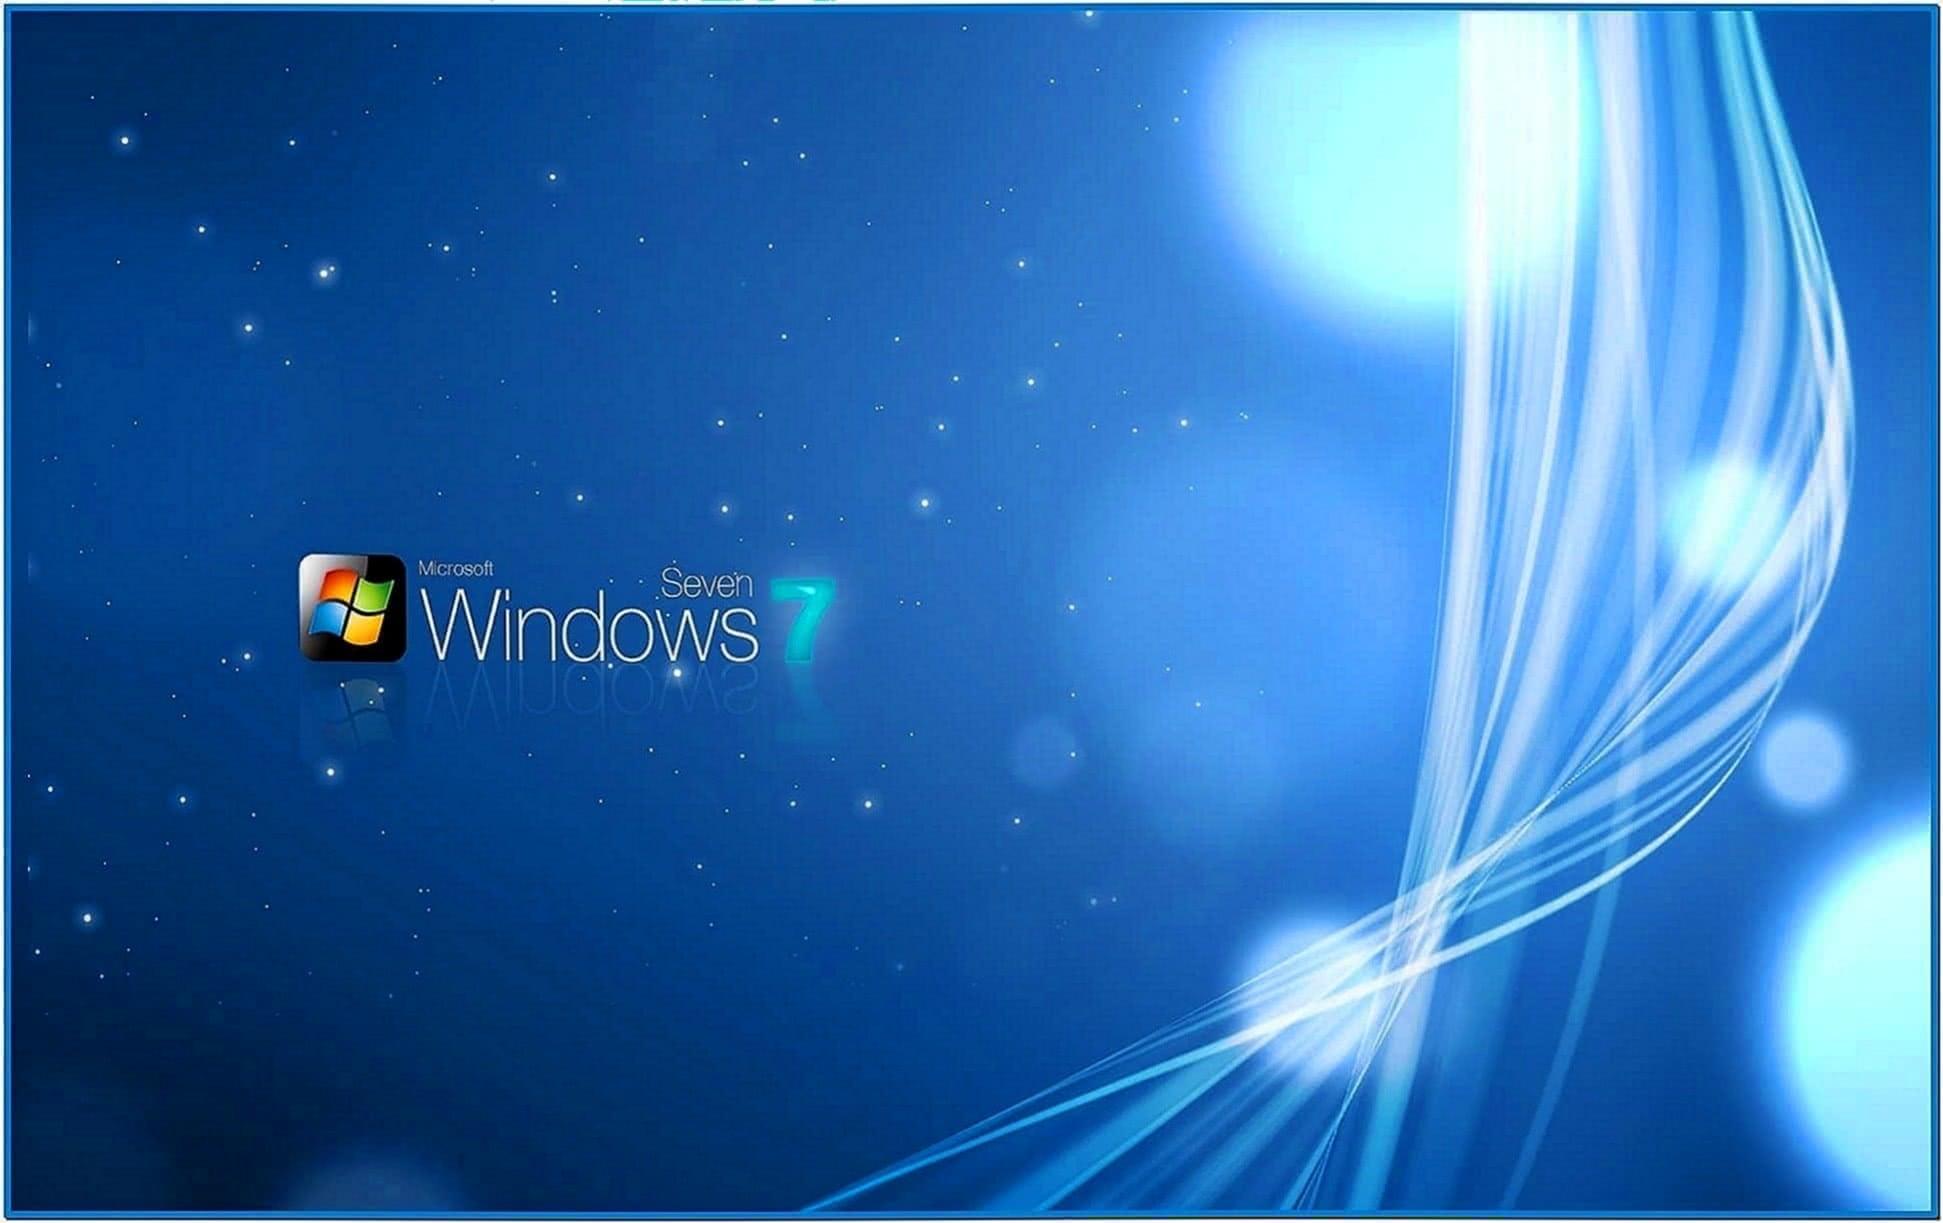 Screensavers Windows 7 64bit